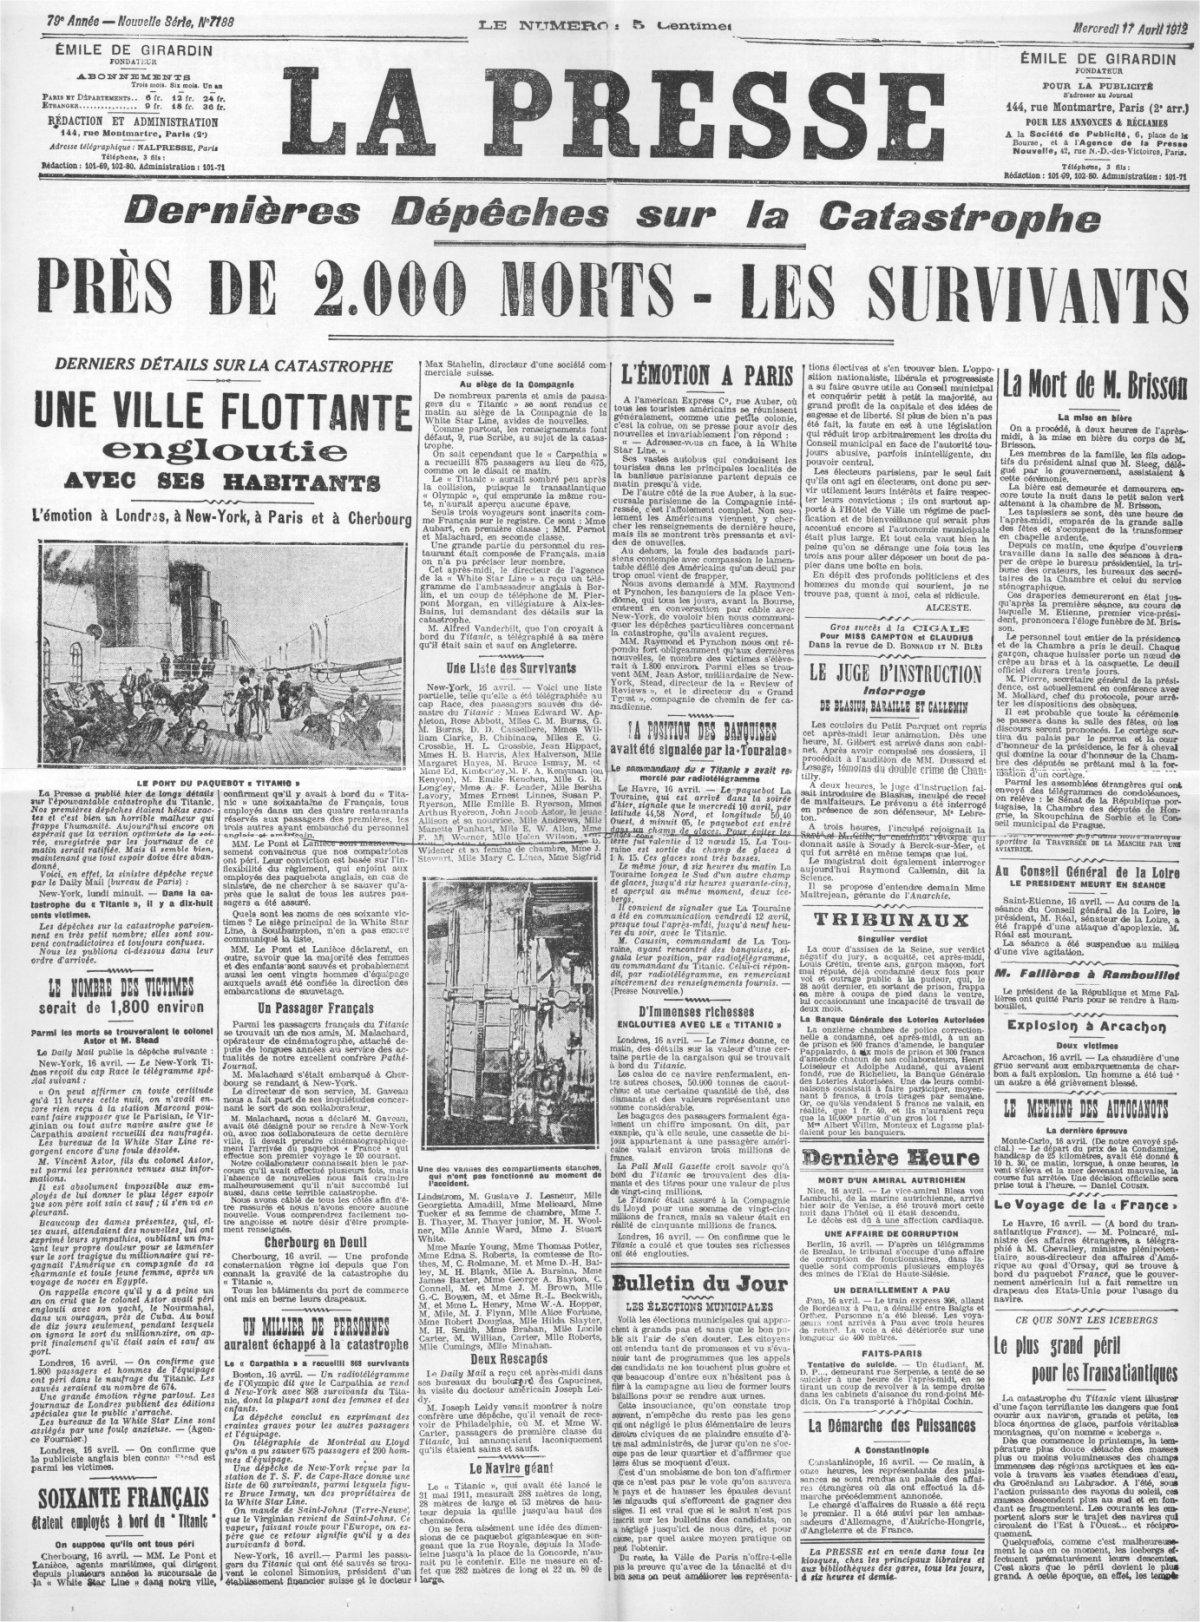 1912-04-17 la presse.jpg